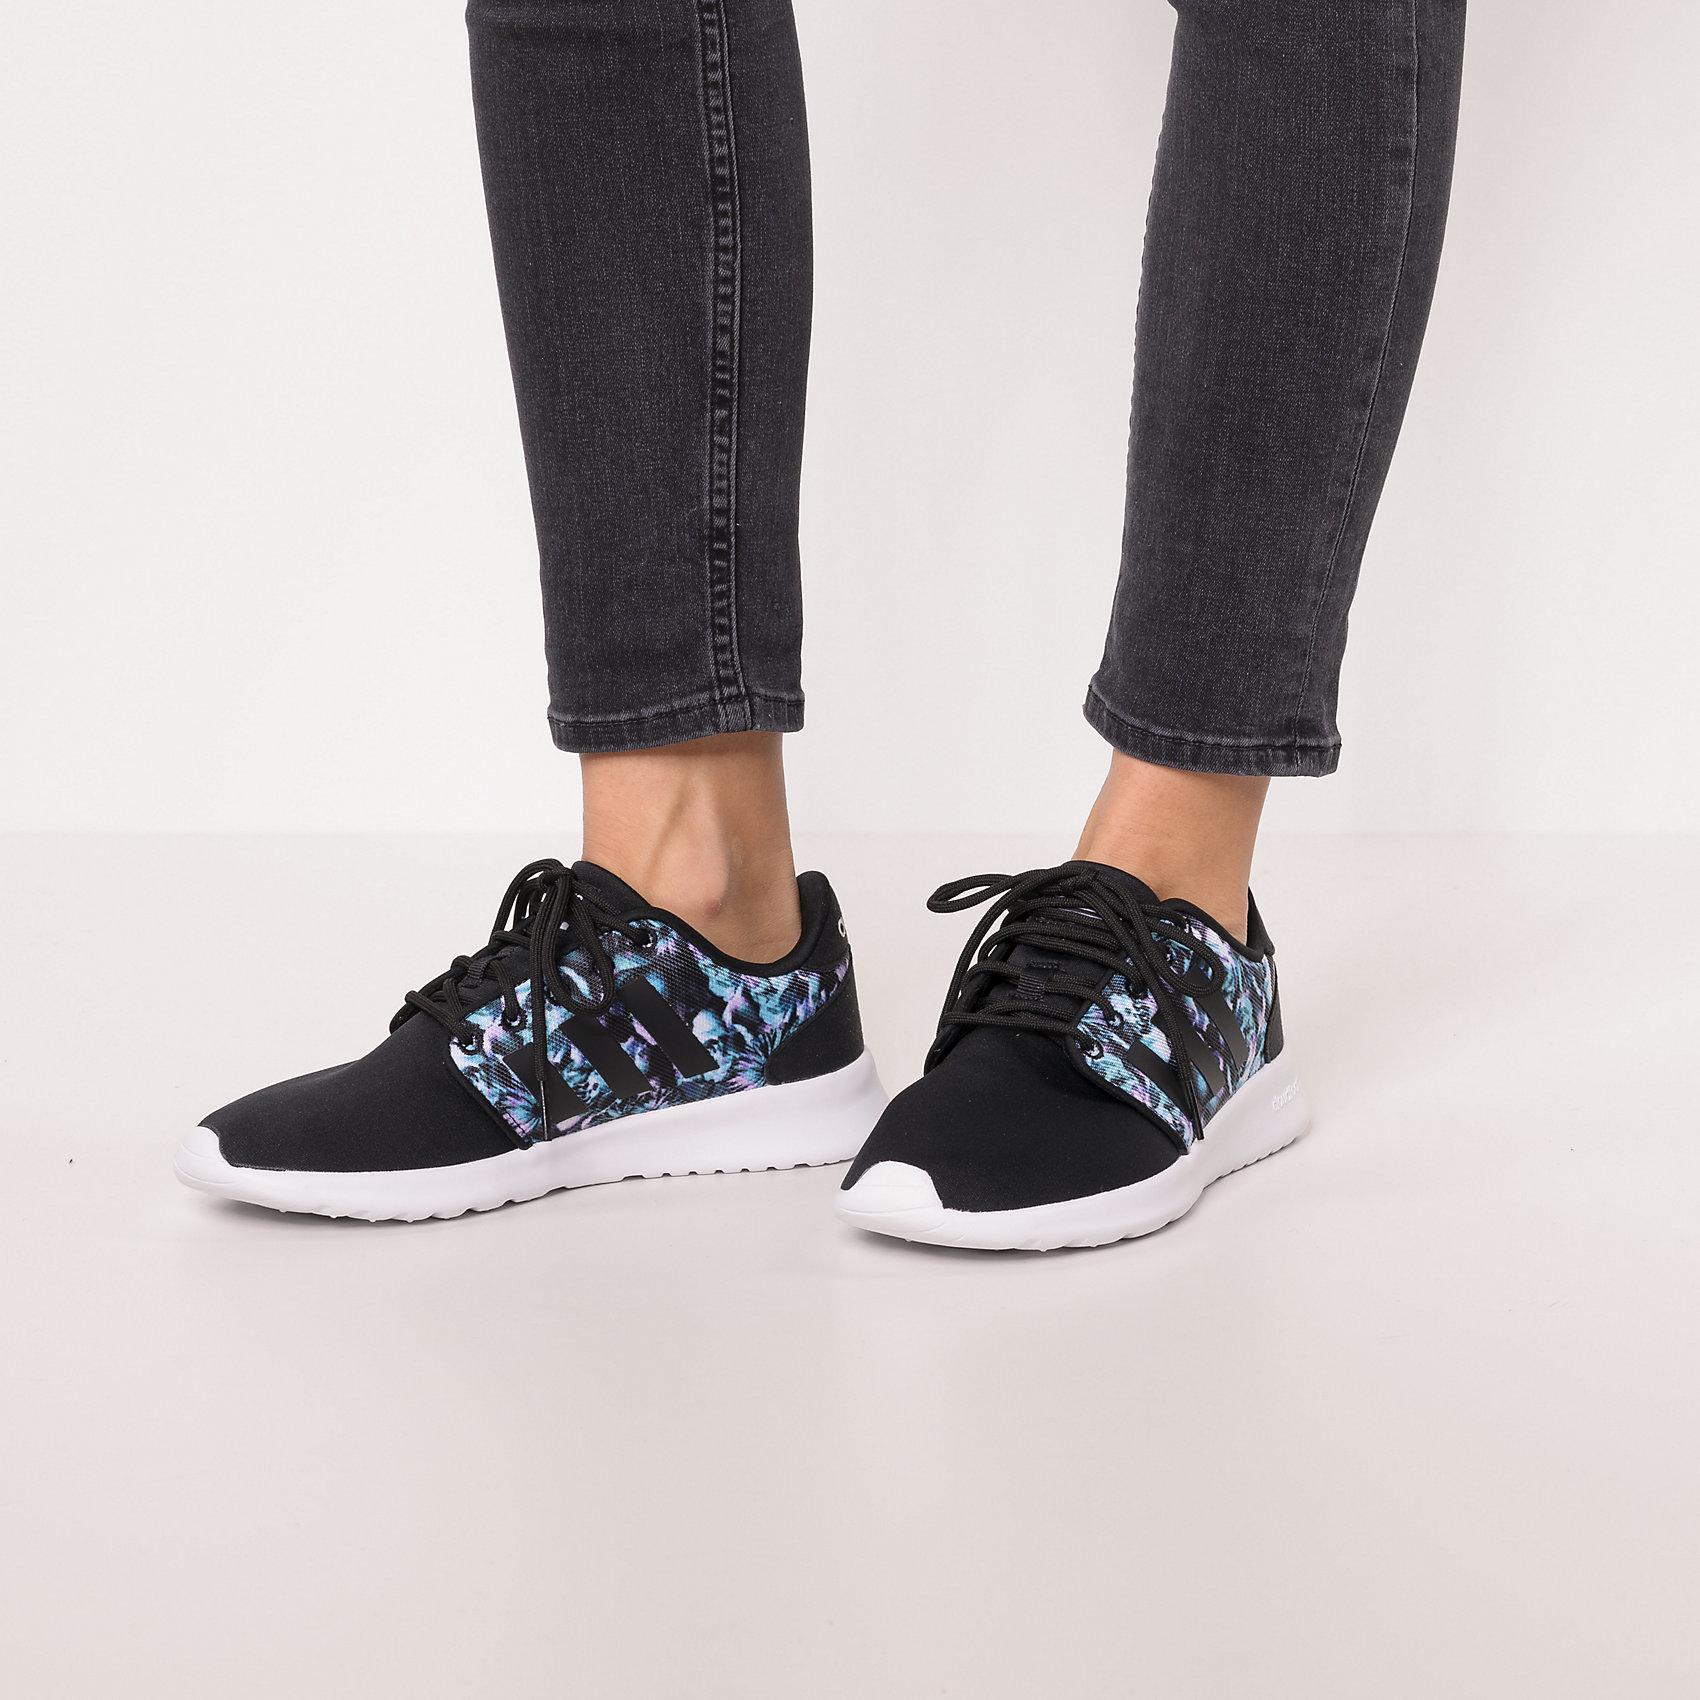 Details zu Neu adidas Sport Inspired Cf Qt Racer W Sneakers 7501979 für Damen